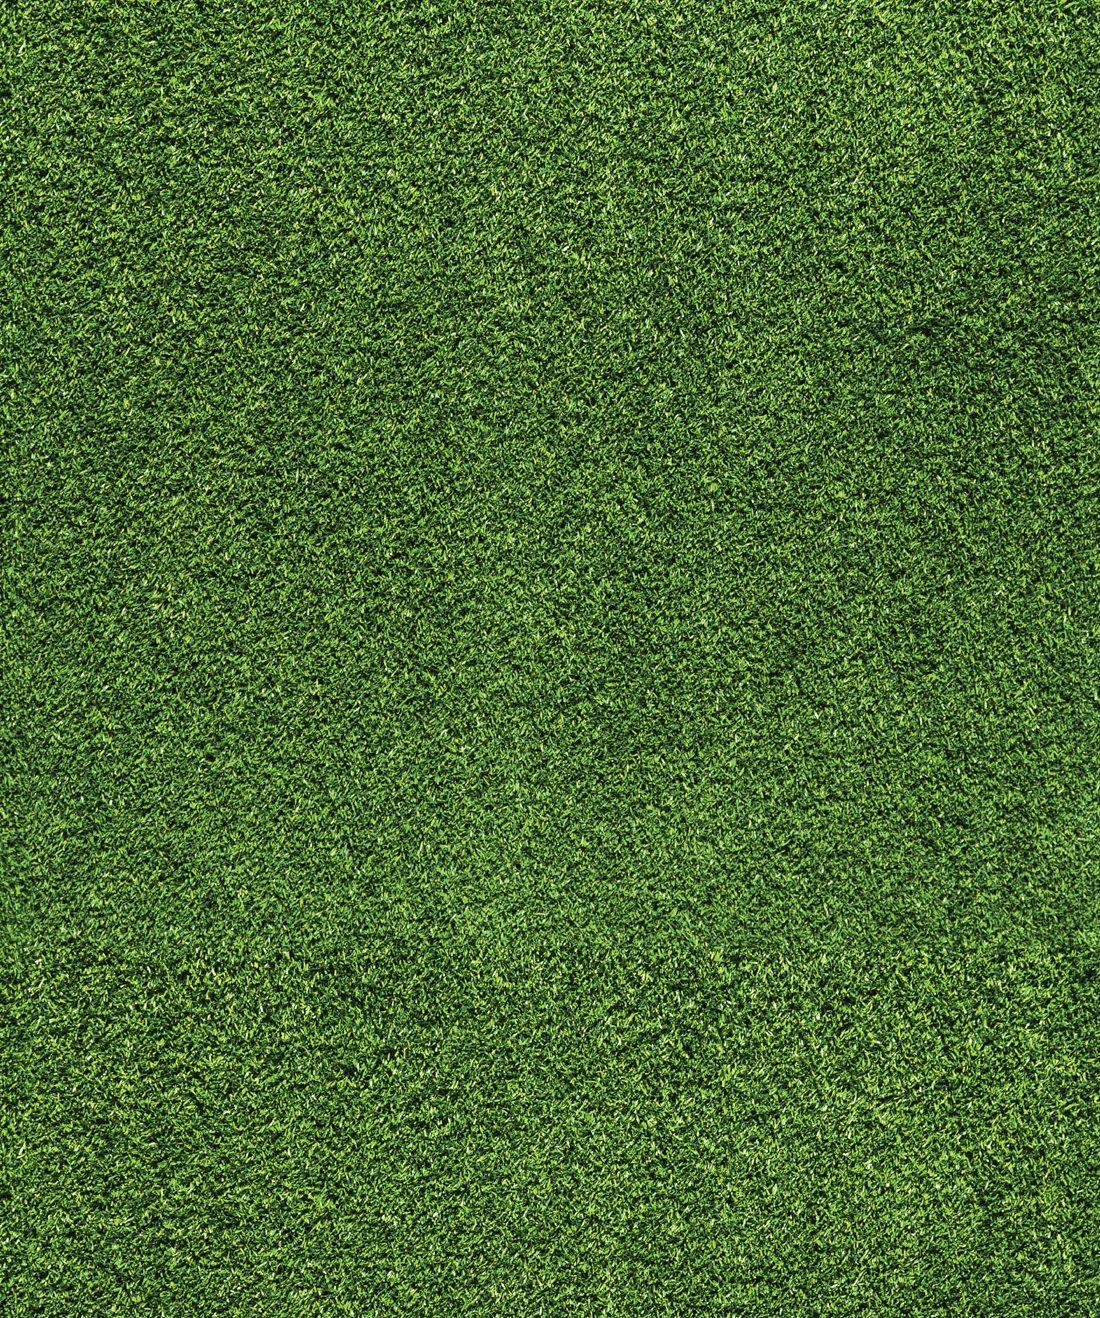 Artificial Turf Wallpaper Fake Green Grass Milton King